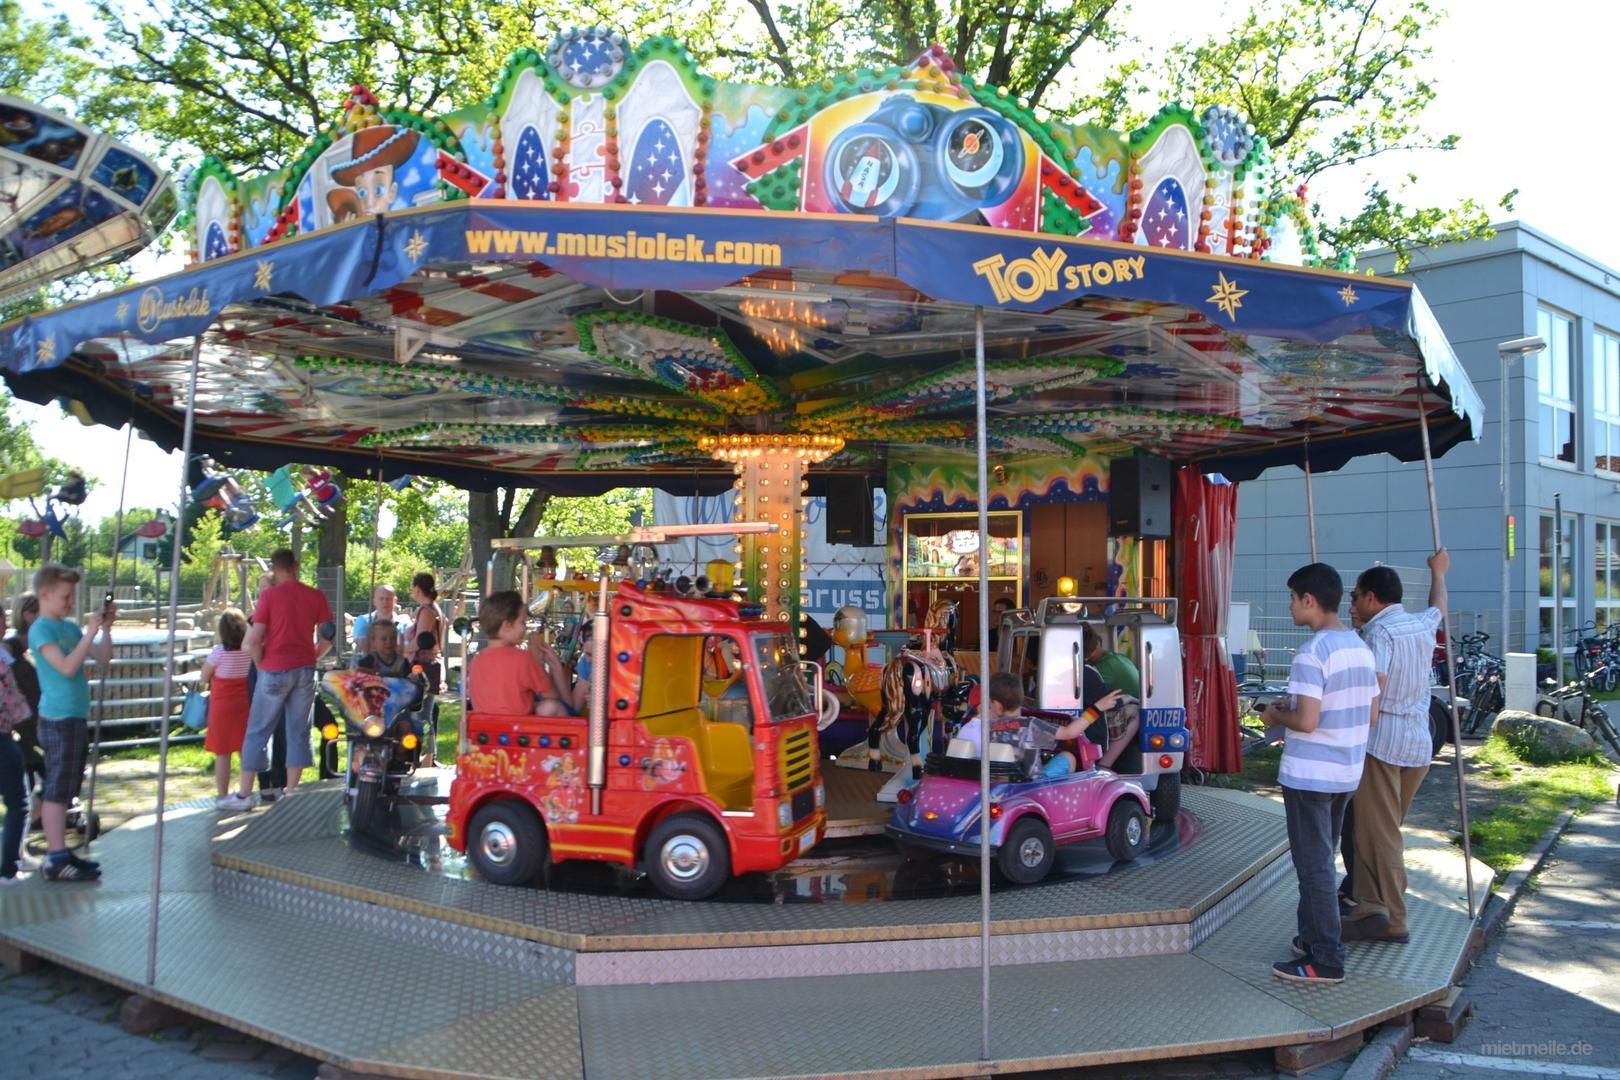 Karussell mieten & vermieten - Kinderkarussell Toy Story in Lehrte